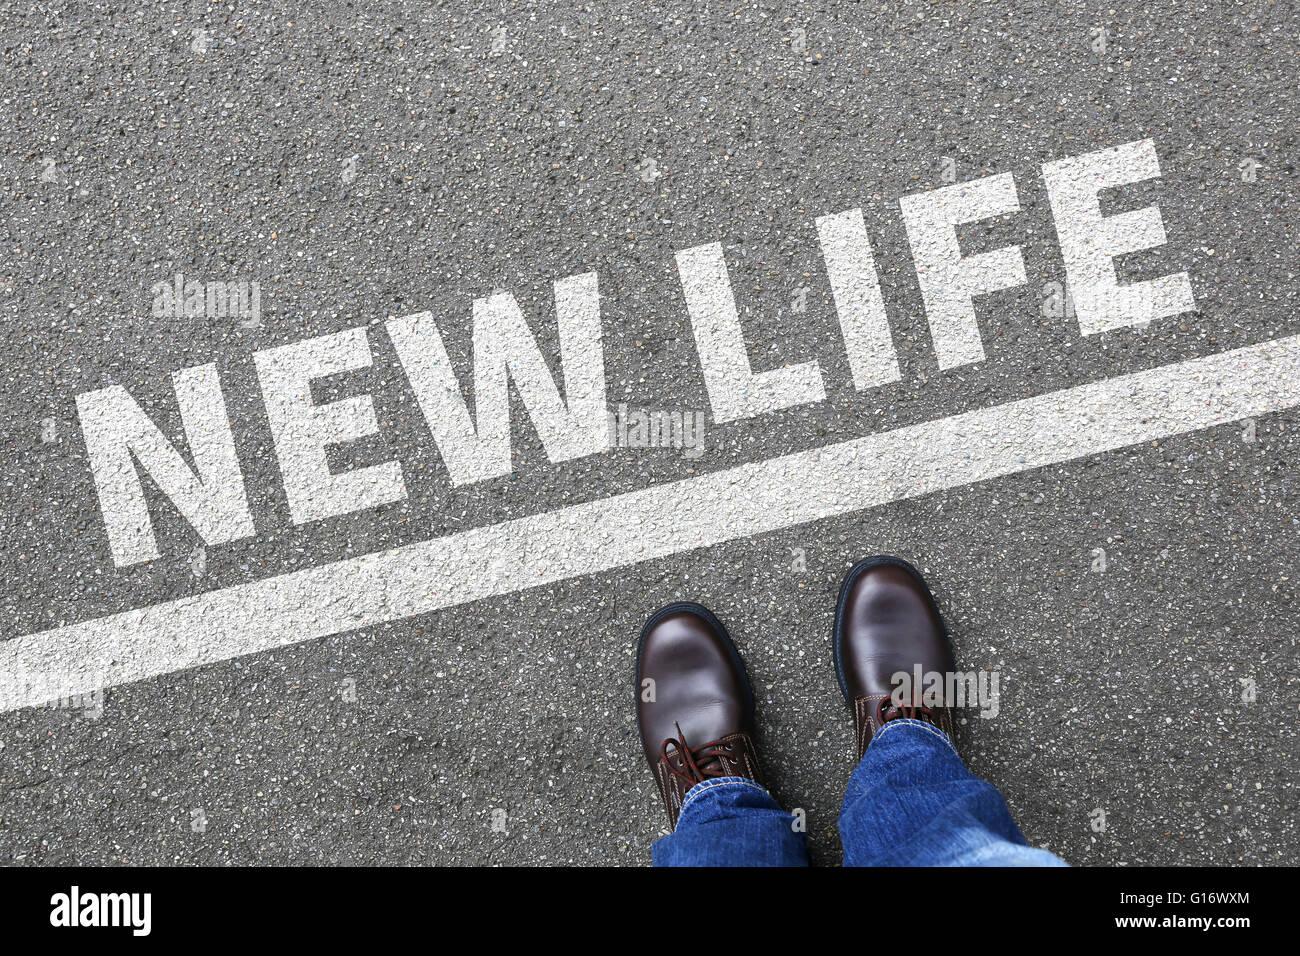 Entscheiden, Leben Anfang Neuanfänge Zukunft Vergangenheit Ziele Erfolg Entscheidung ändern Stockbild